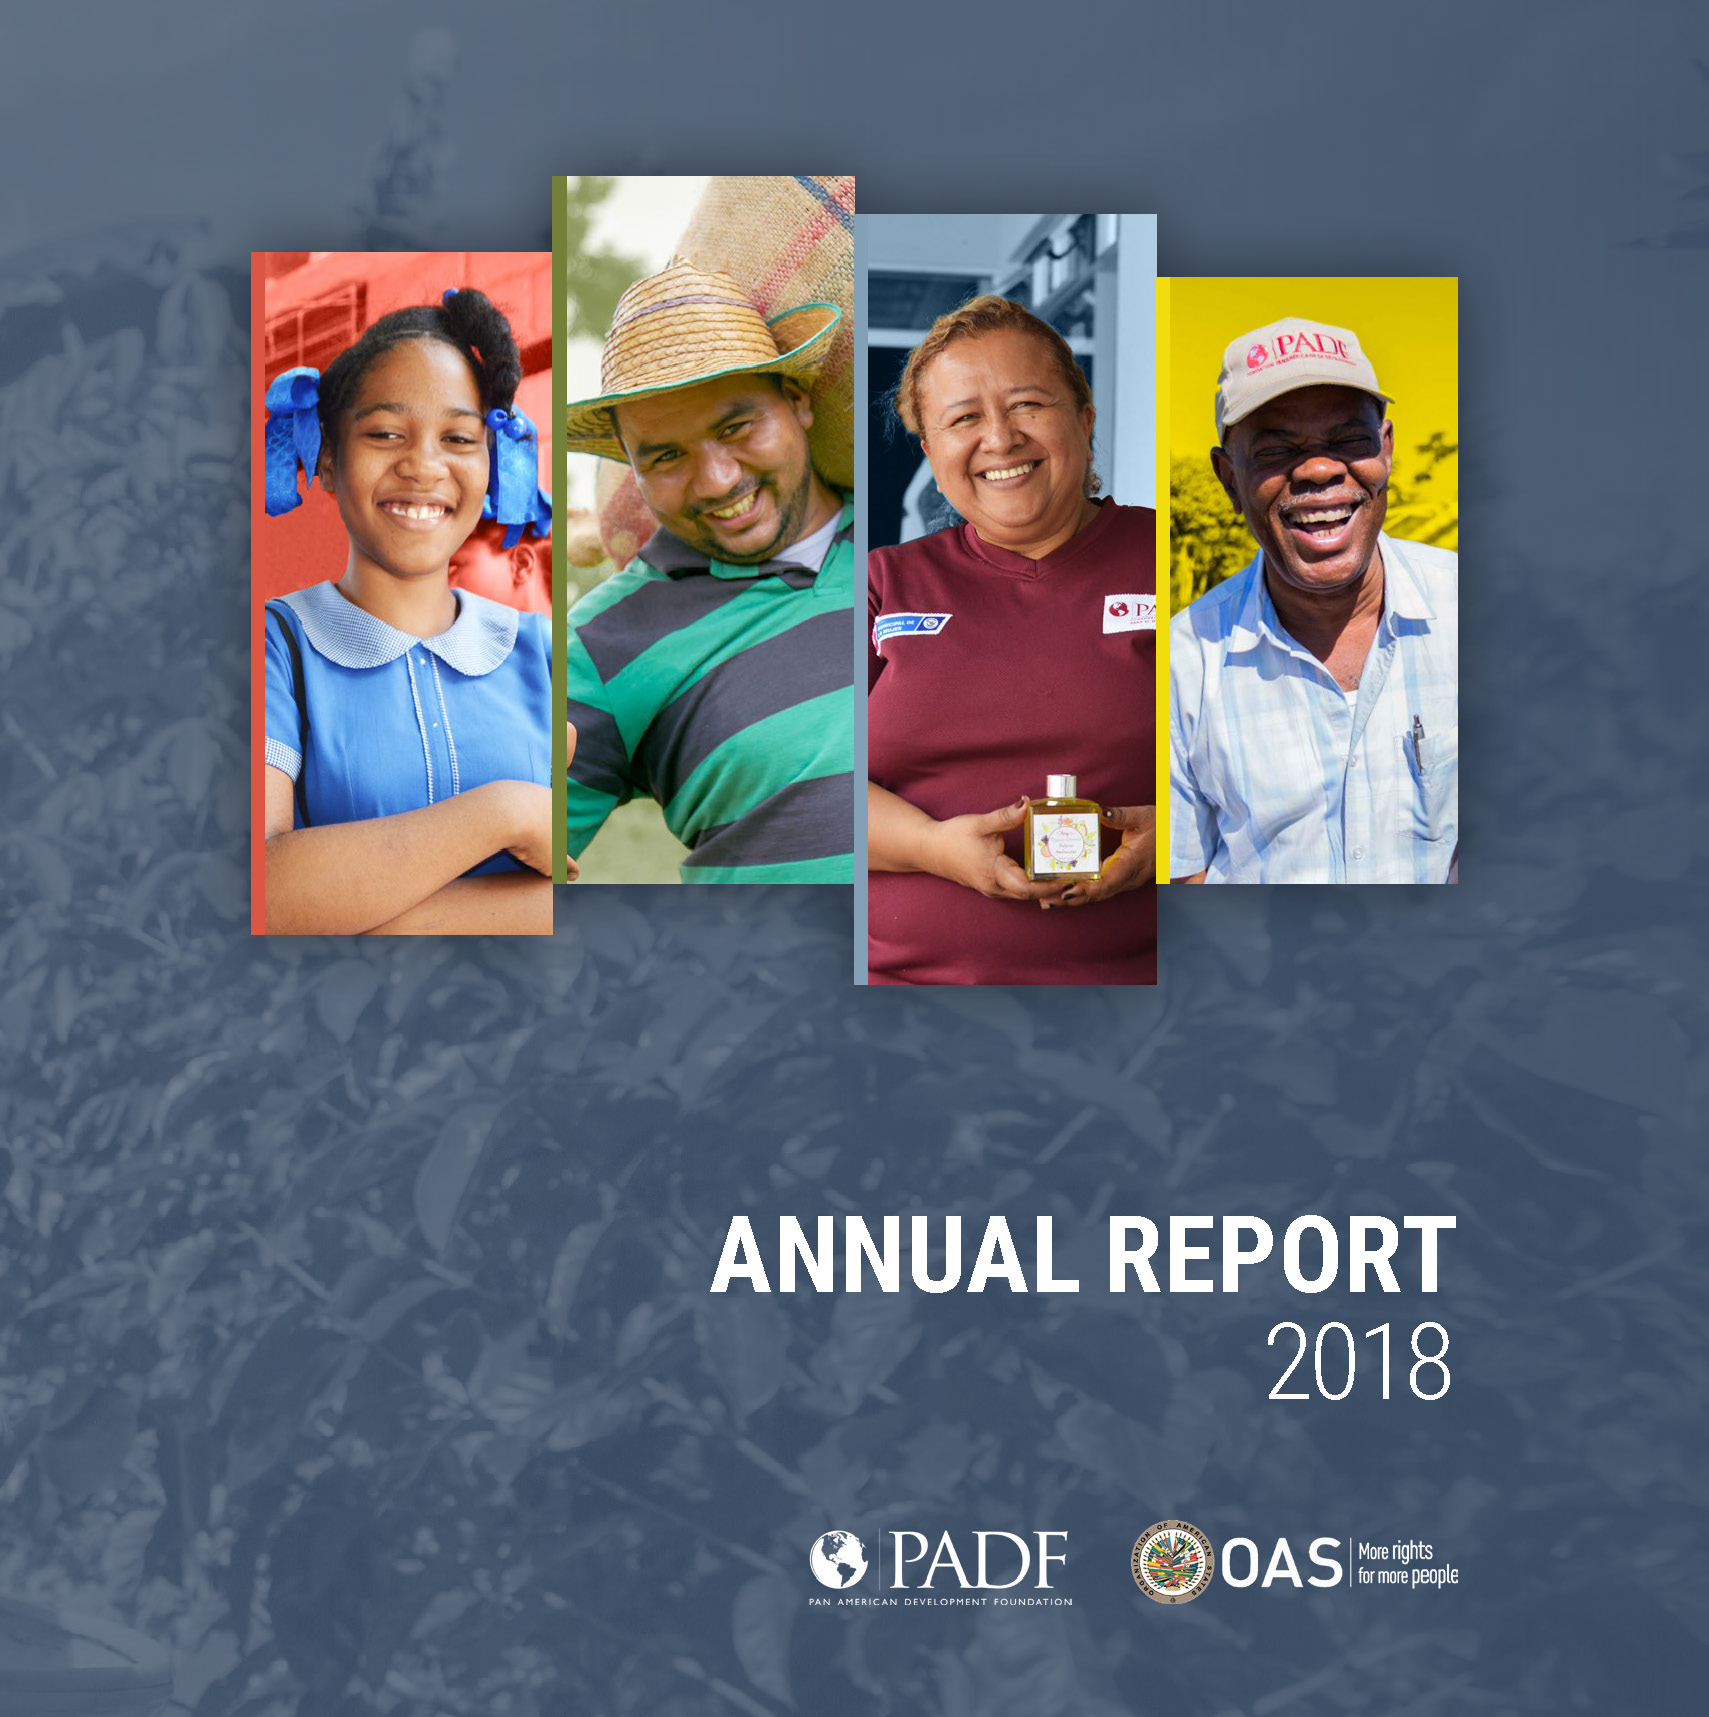 Annual Report 2018 1.jpg